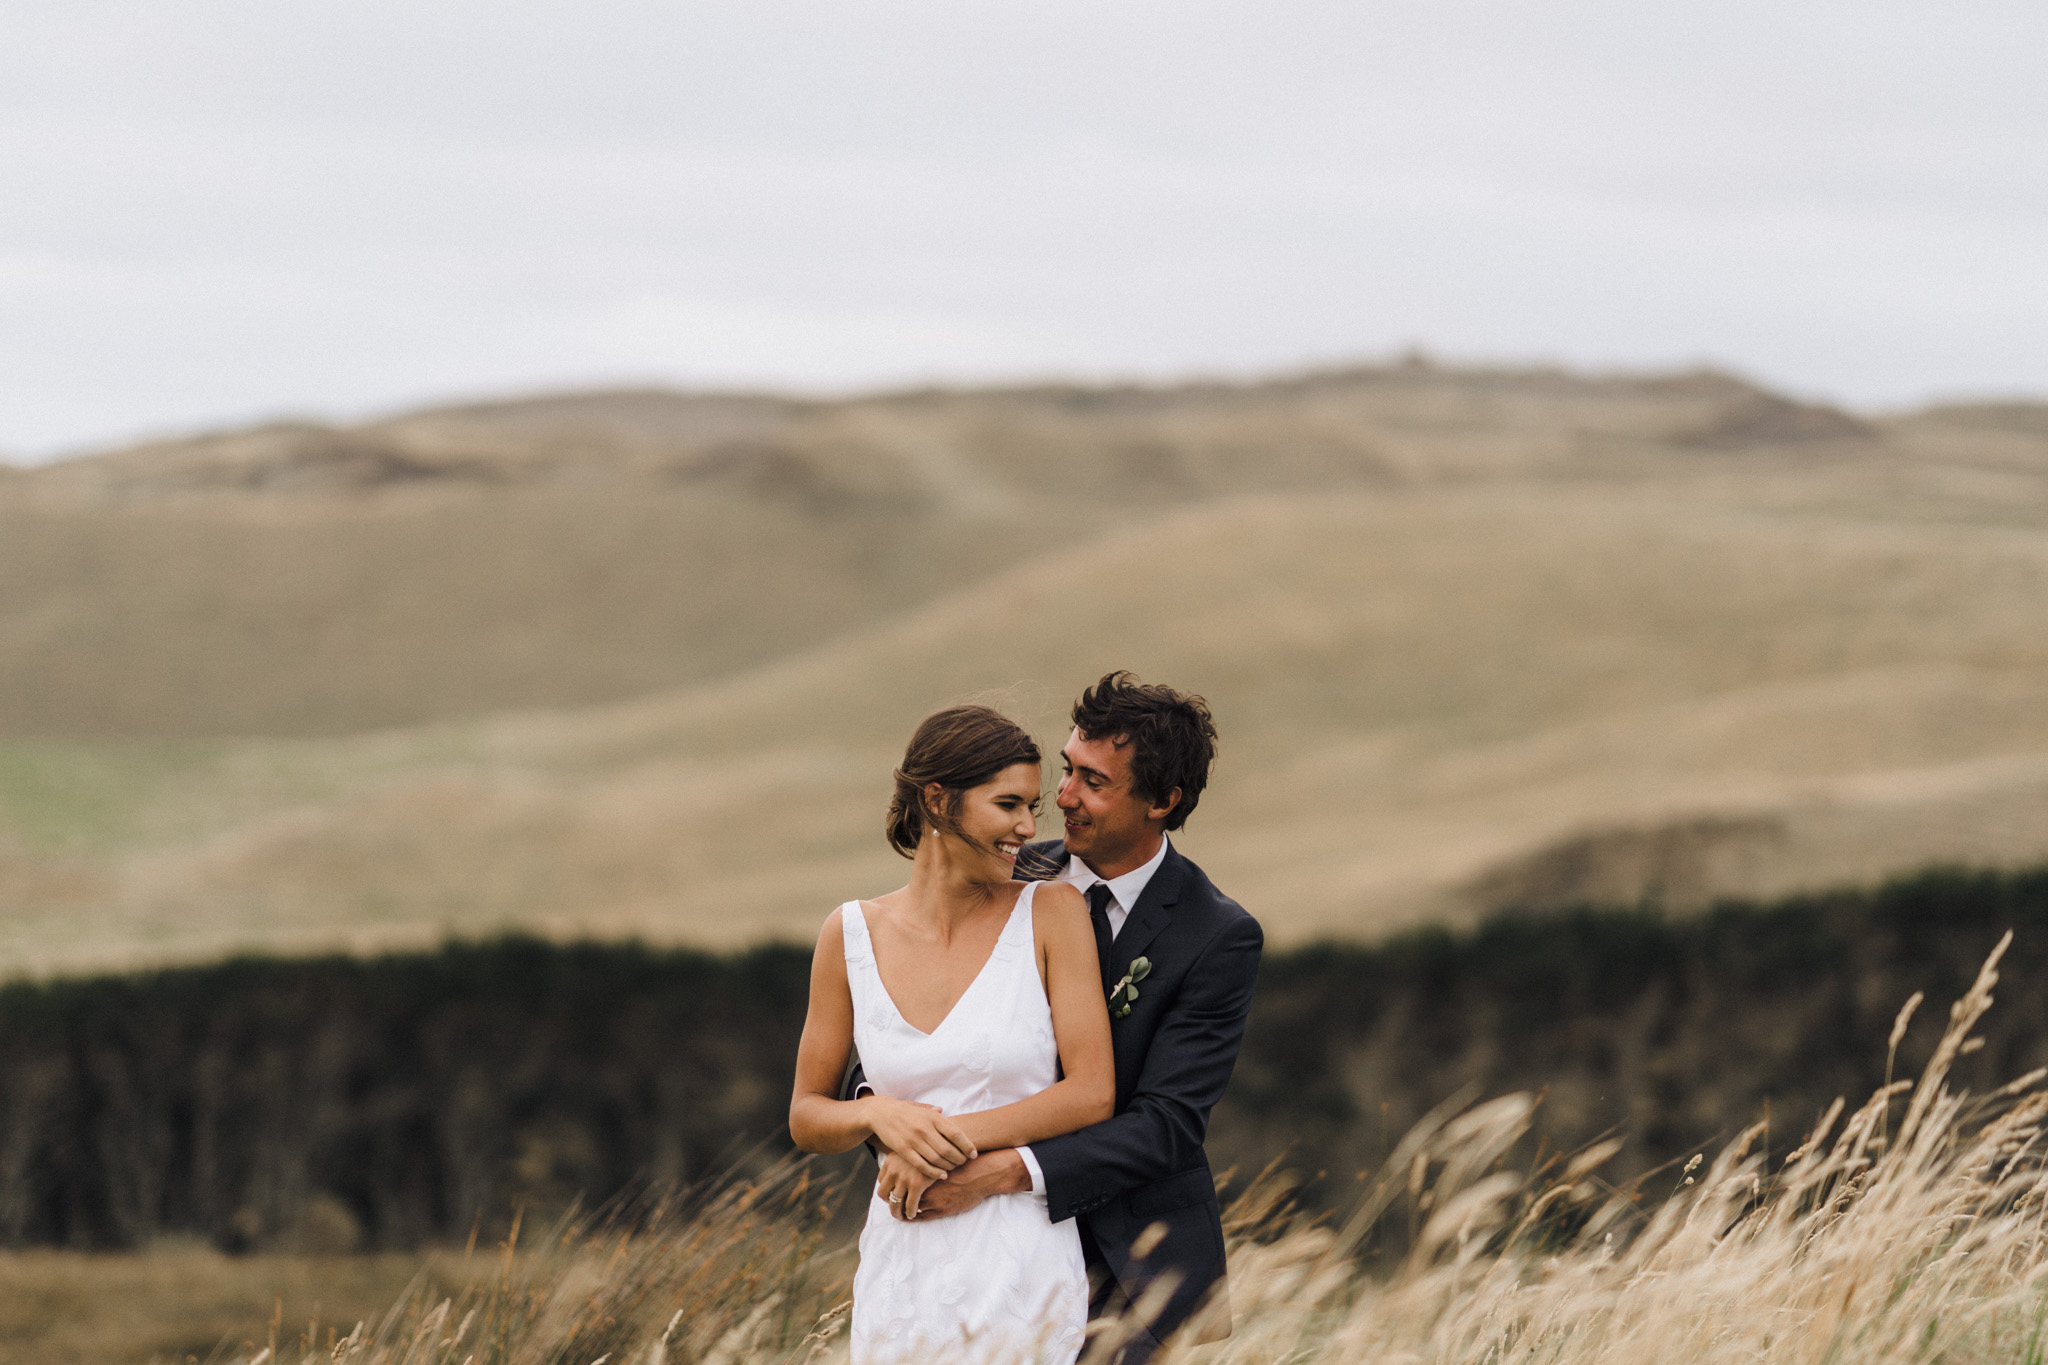 newfound-h-m-castaways-waiuku-auckland-wedding-photographer-158